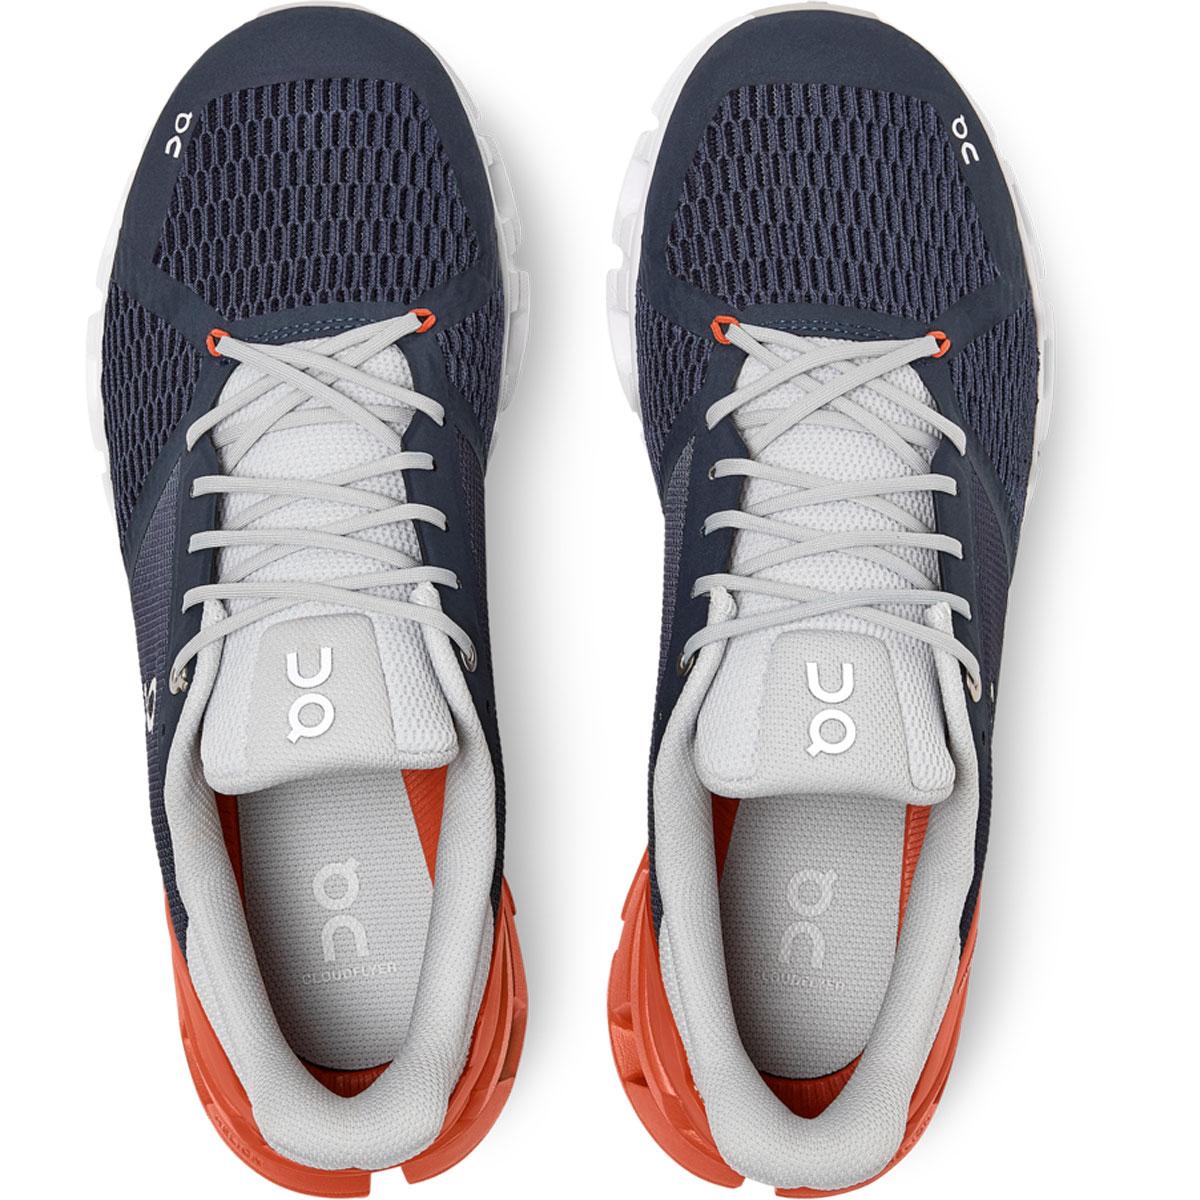 Men's On Cloudflyer 2.0 Running Shoe - Color: Midnight/Rust - Size: 7 - Width: Regular, Midnight/Rust, large, image 3